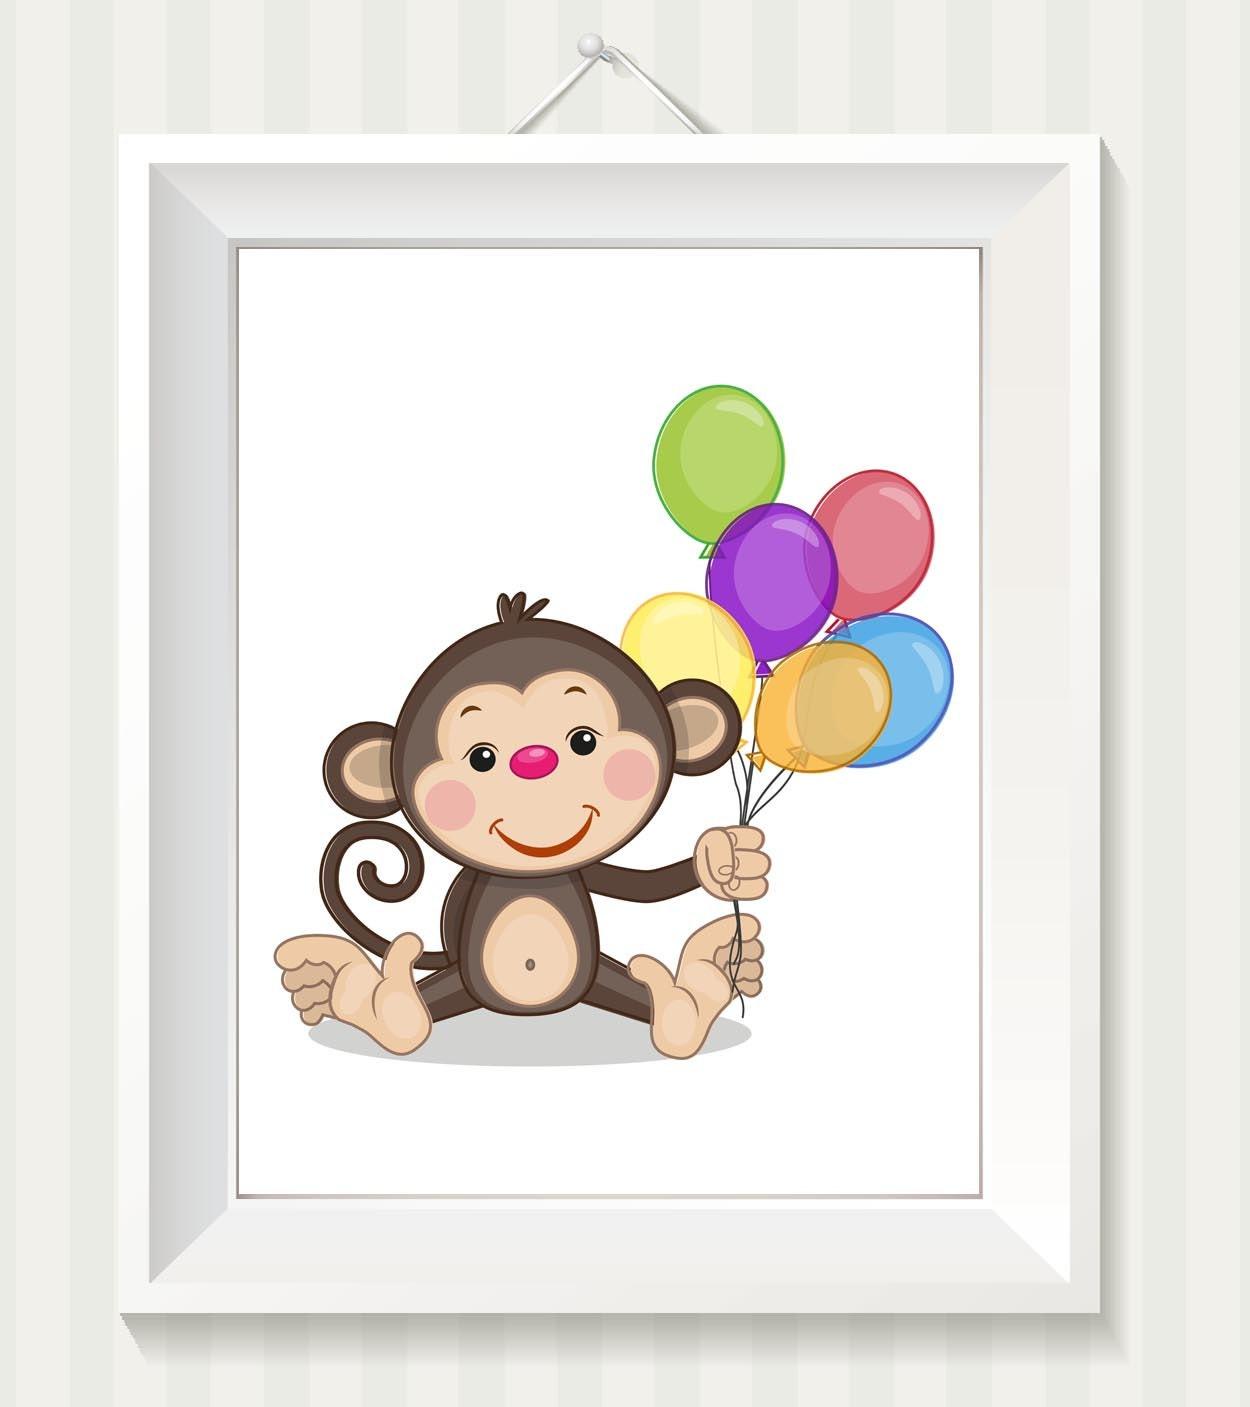 Monkey Nursery Art Monkey Nursery Print Baby Art Baby Animal Brown Beige Balloons Print Child Kids W